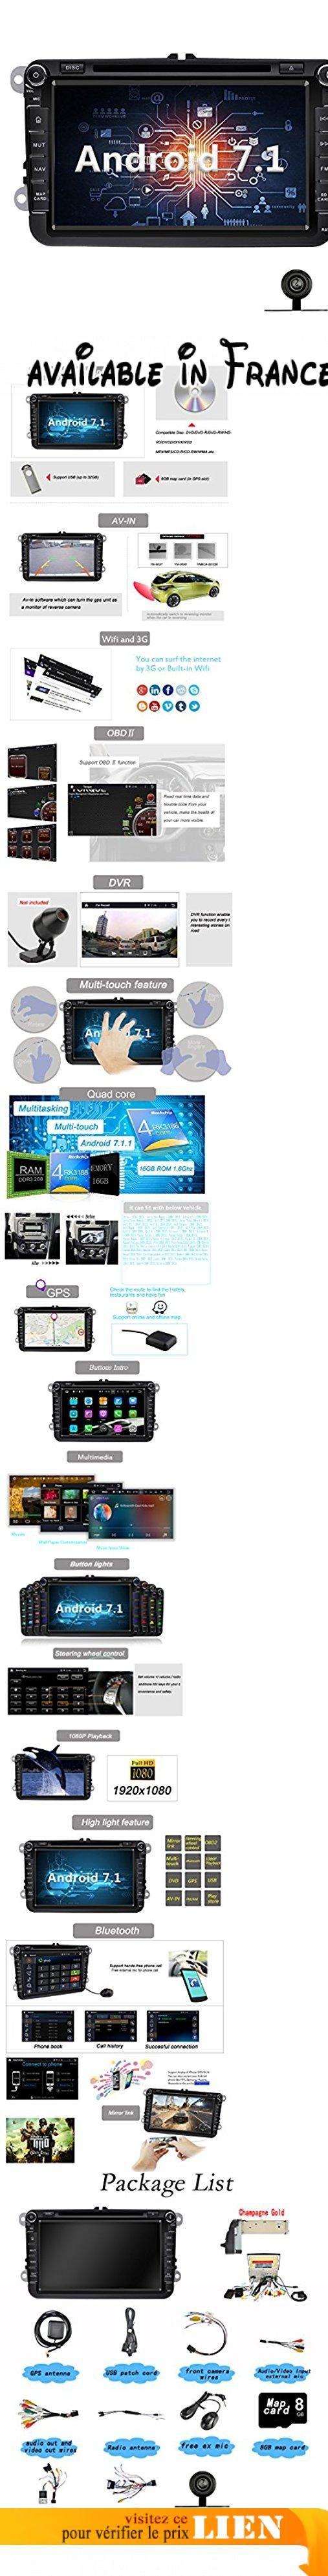 YINUO 8 pouces 2 Din Android 7.1.1 Nougat 2GB RAM Quad Core écran tactile Autoradio gps Lecteur de DVD GPS Navigation gps avec Bluetooth 7 Couleurs Button illumination Autoradio pour VW/SKODA Golf Polo Jetta Passat Touran support DAB OBD2 WiFi (Autoradio avec Caméra arrière 1). Pour Jetta ( 2010- 2013), Jetta SportWagen ( 2006- 2013), Jetta GLI ( 2006- 2013), Jetta Turbo Hybrid ( 2013), Golf GTI ( 2010- 2012), Golf R ( 2010- 2013), Golf Estate ( 2009- 2012), Golf Wagon